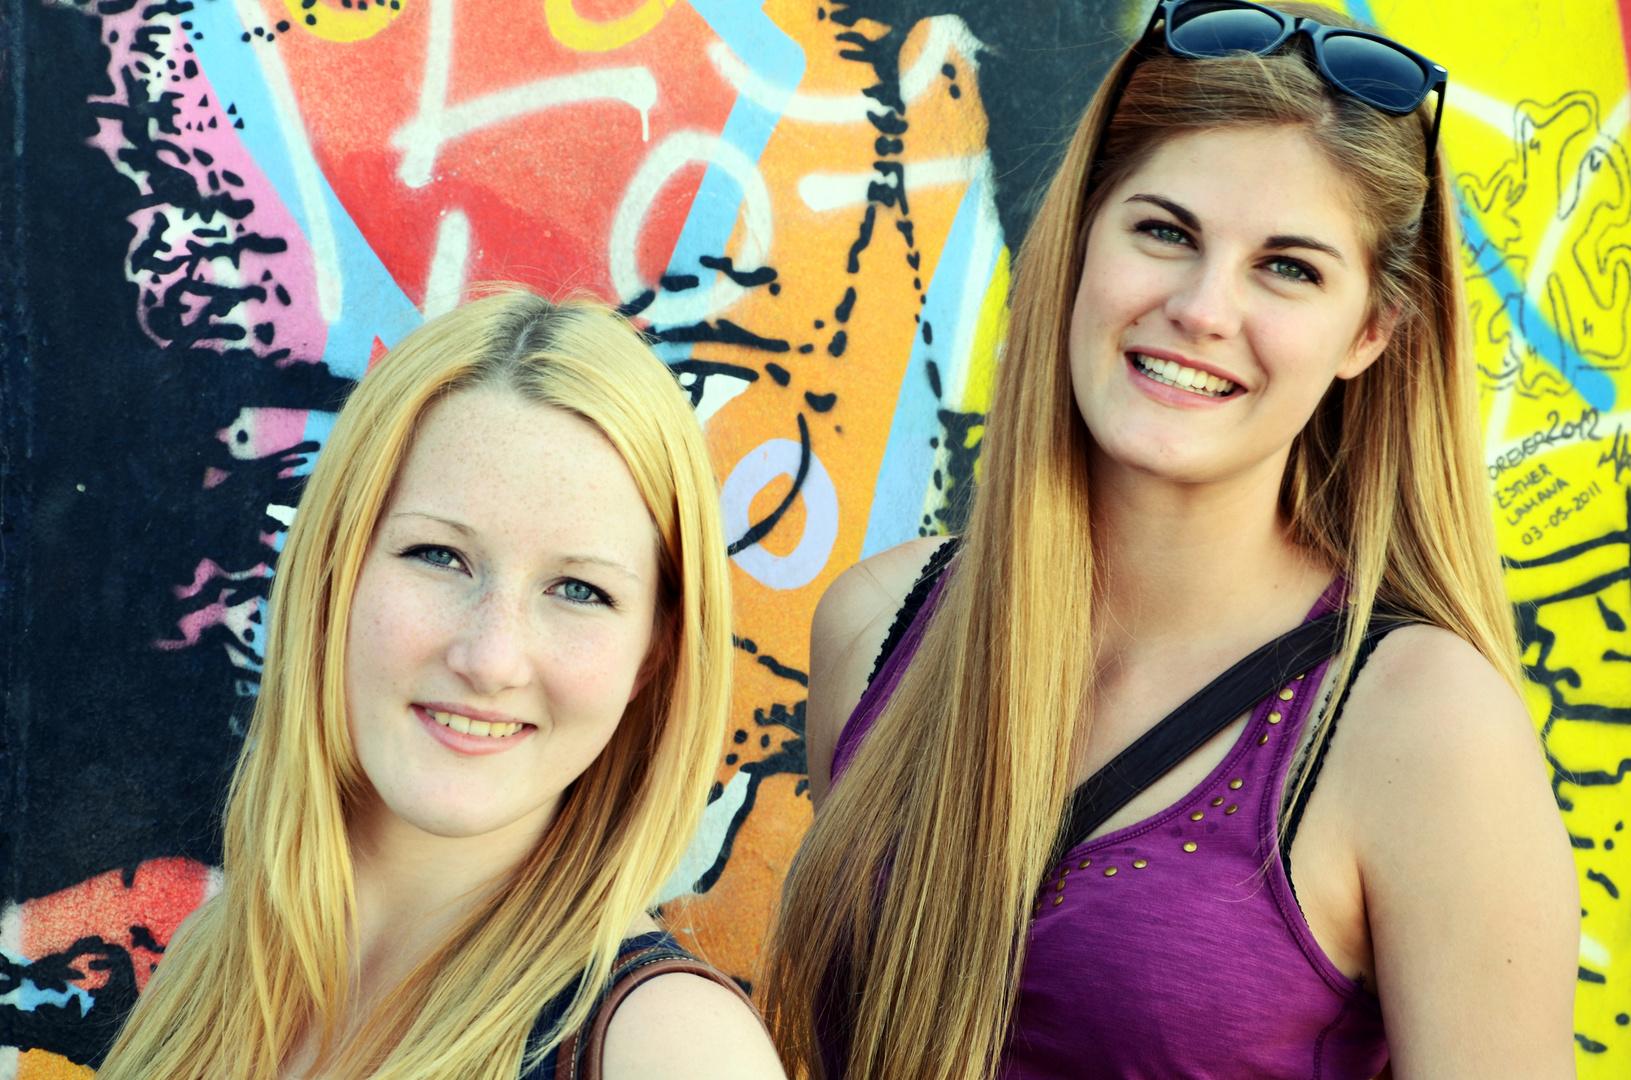 berlin city girls